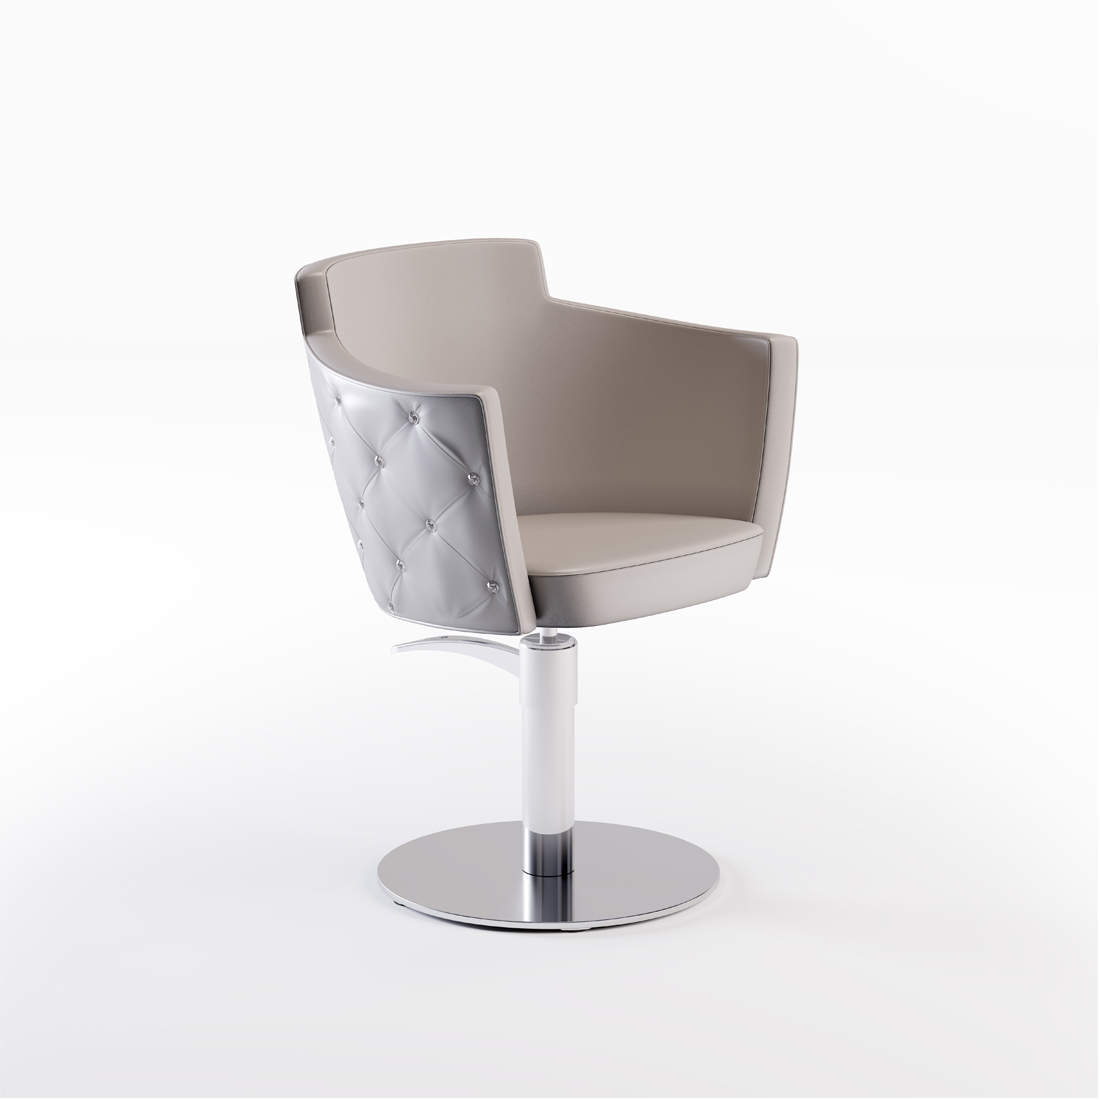 CINDARELLA – Mademoiselle chair – persp. Swarovski